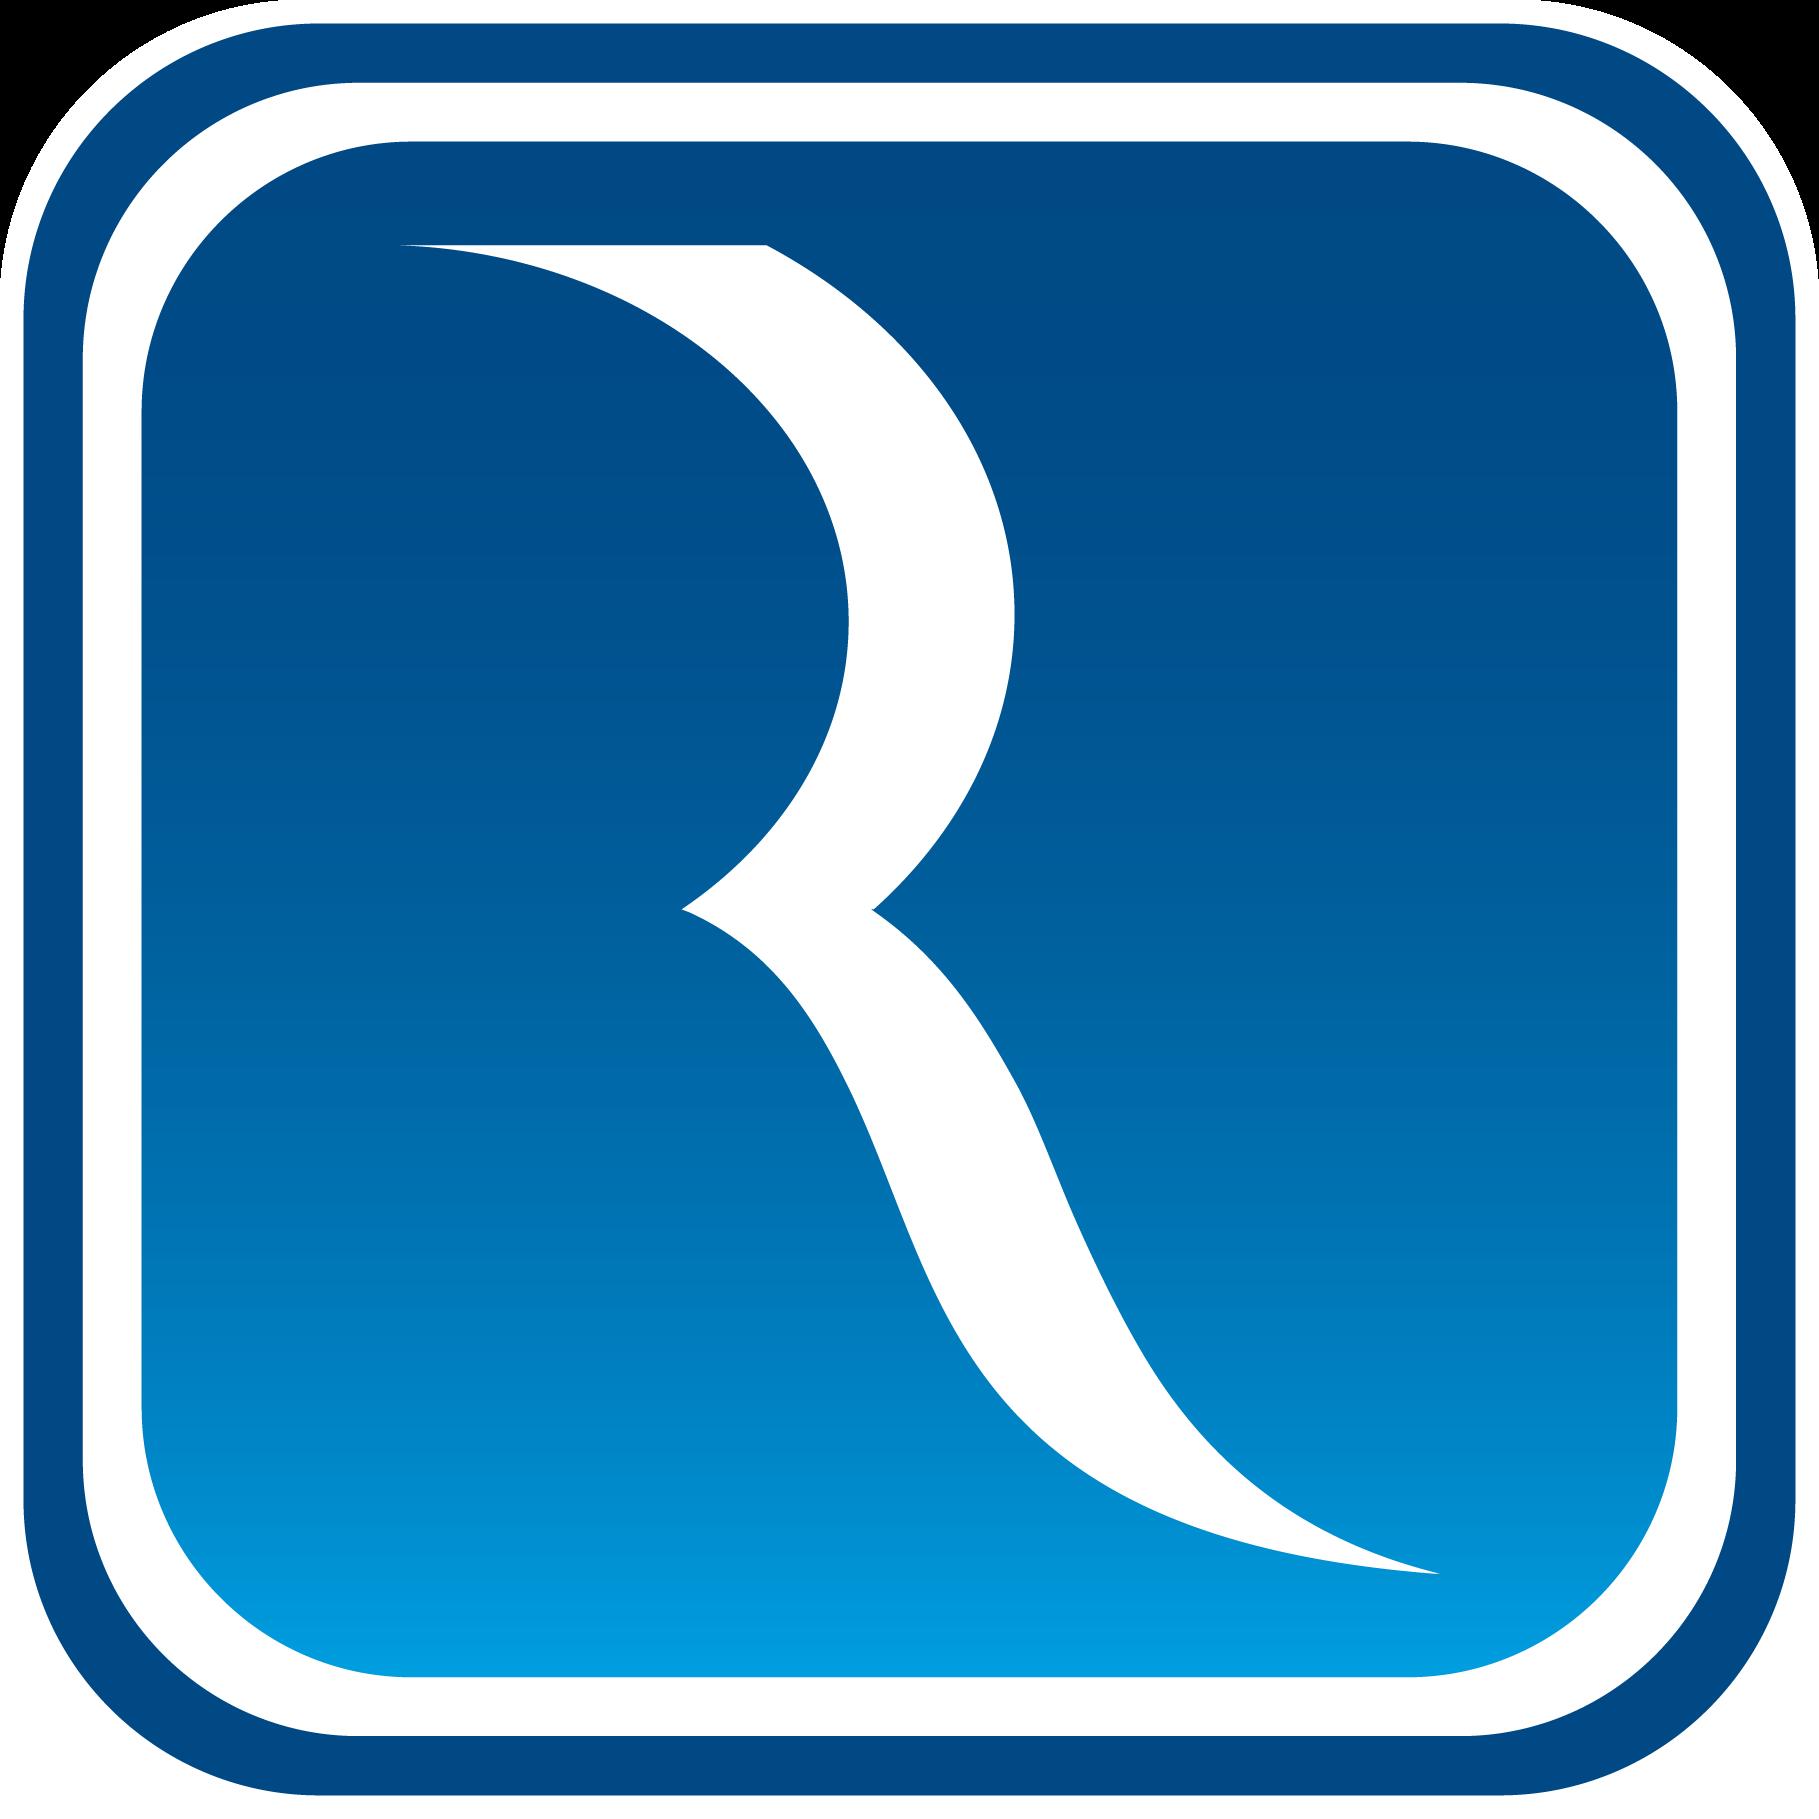 REALI S.R.L.